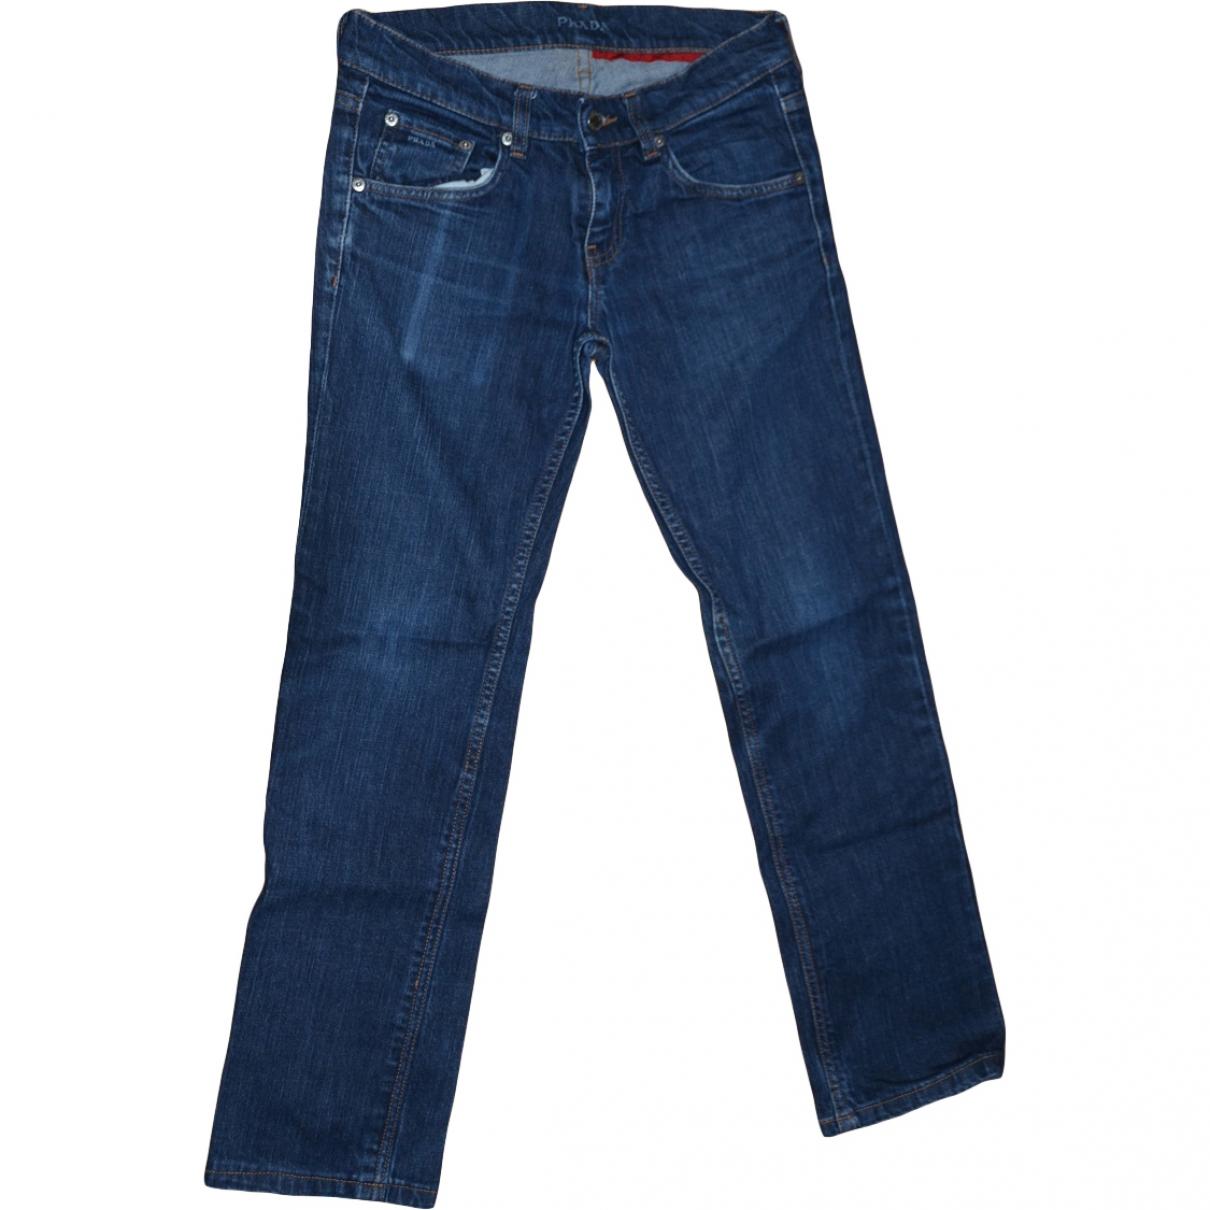 Prada \N Blue Cotton - elasthane Jeans for Women 26 US